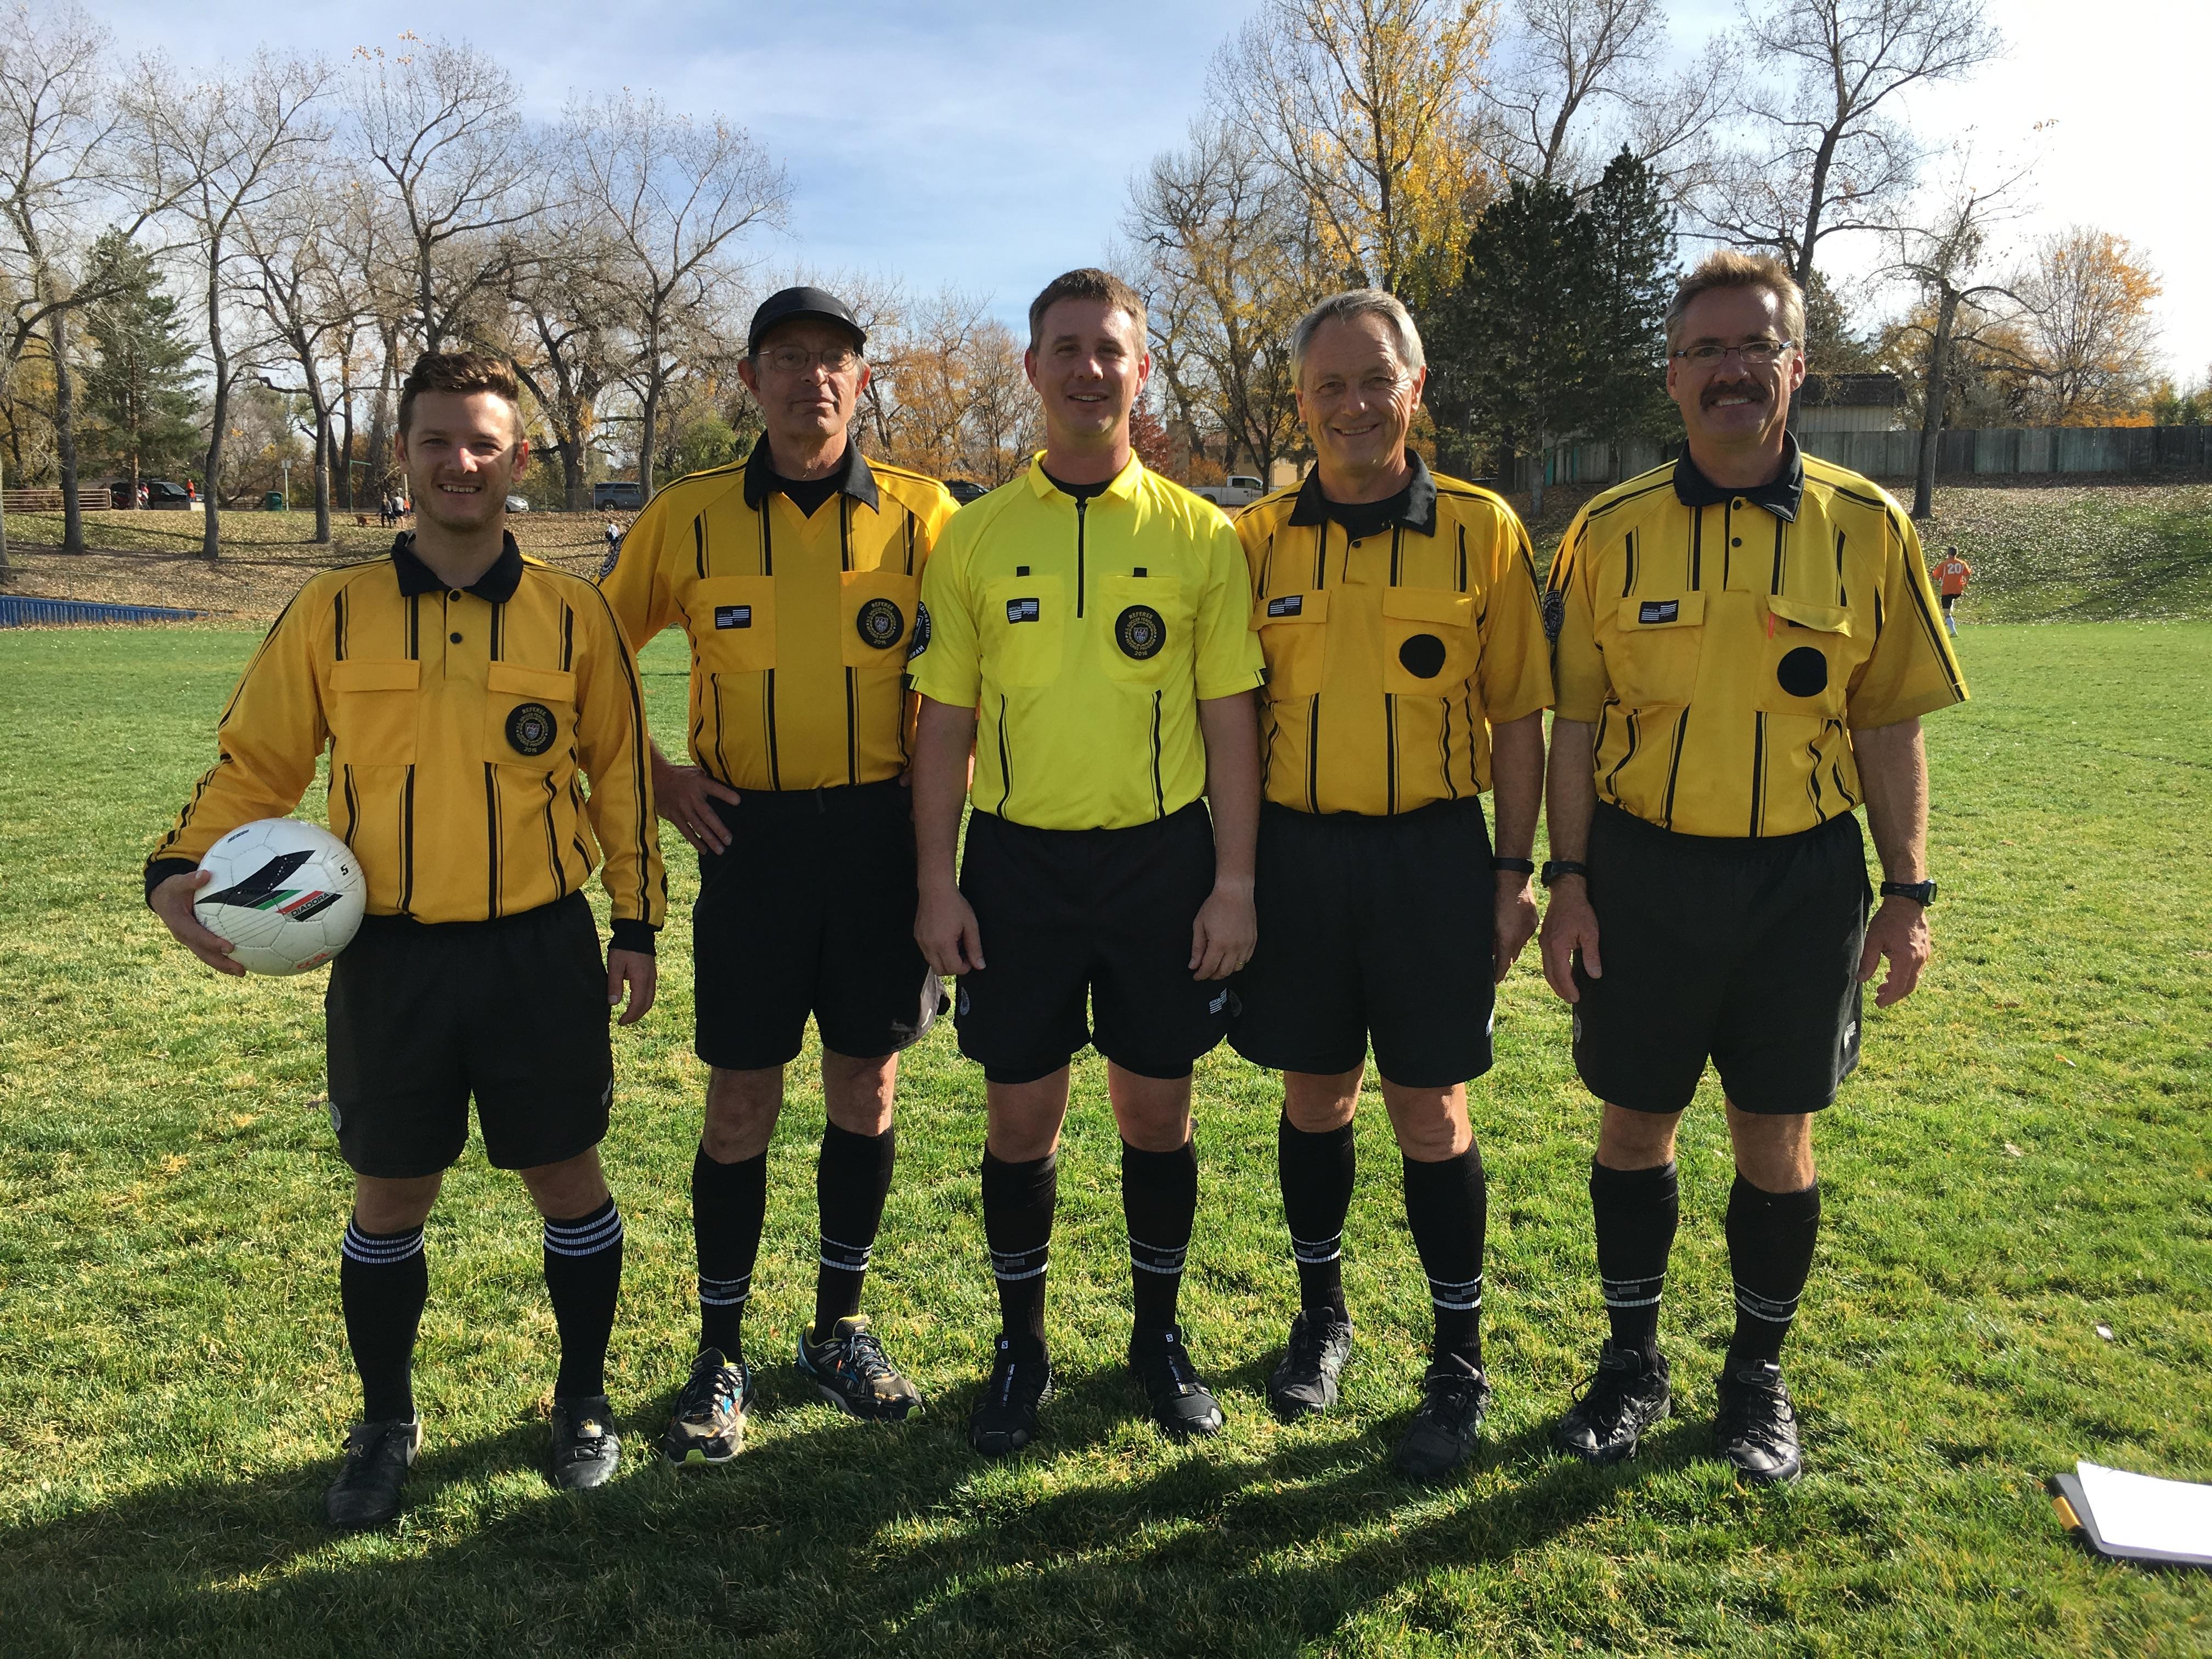 officialsf16